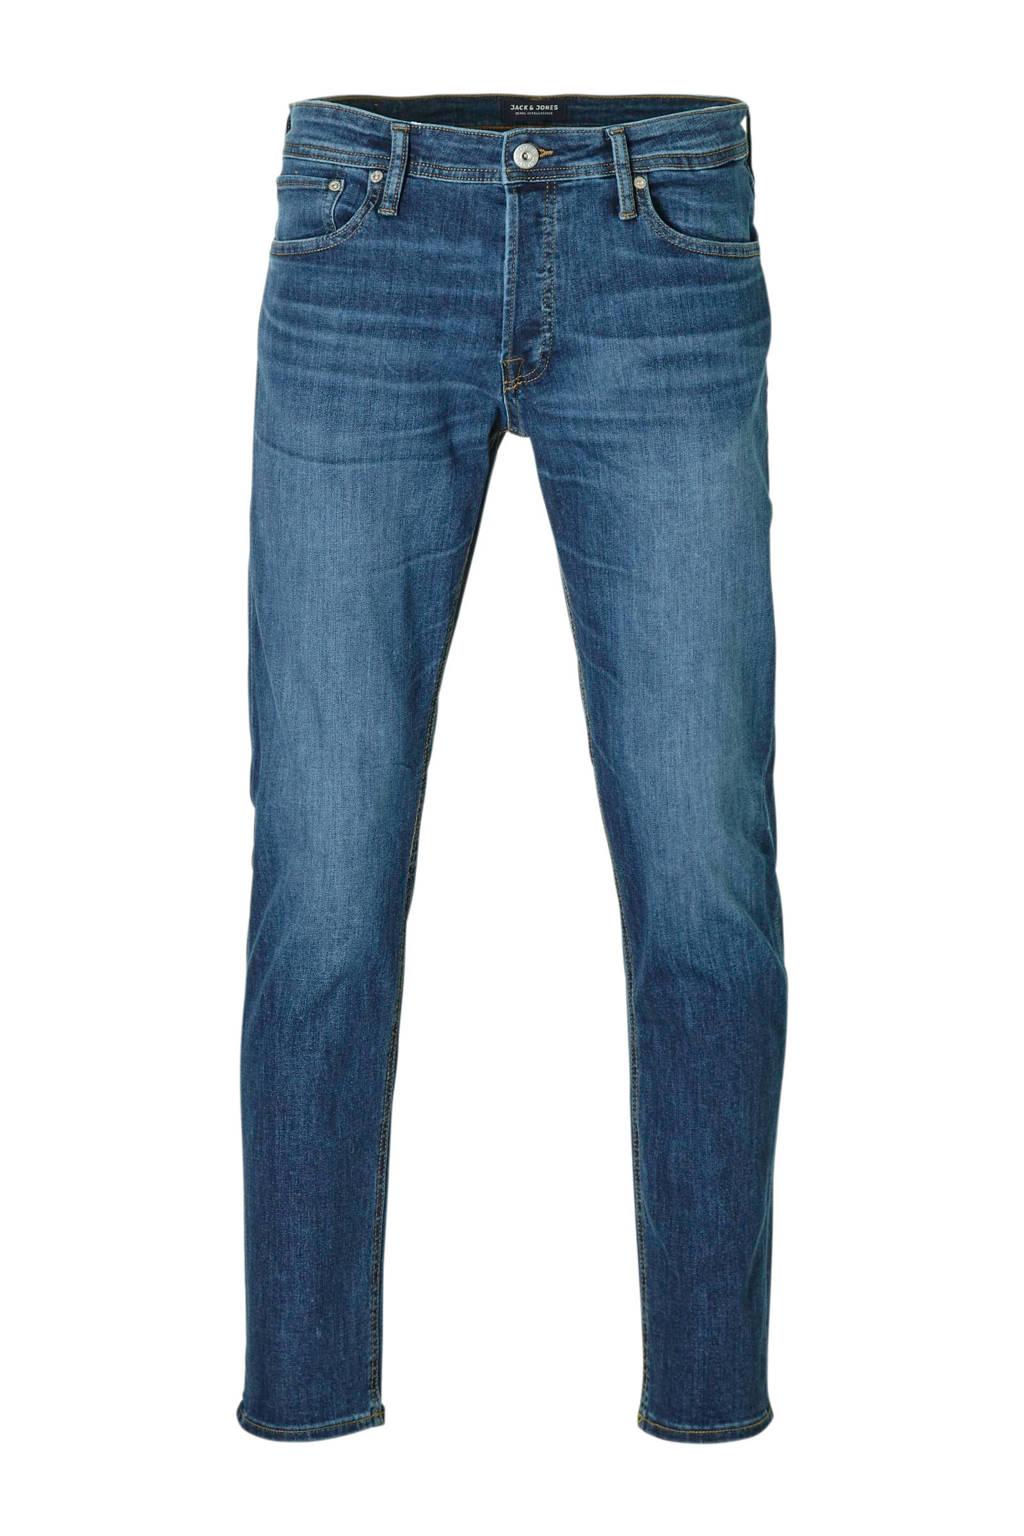 Jack & Jones Originals regular fit jeans Mike, Blauw